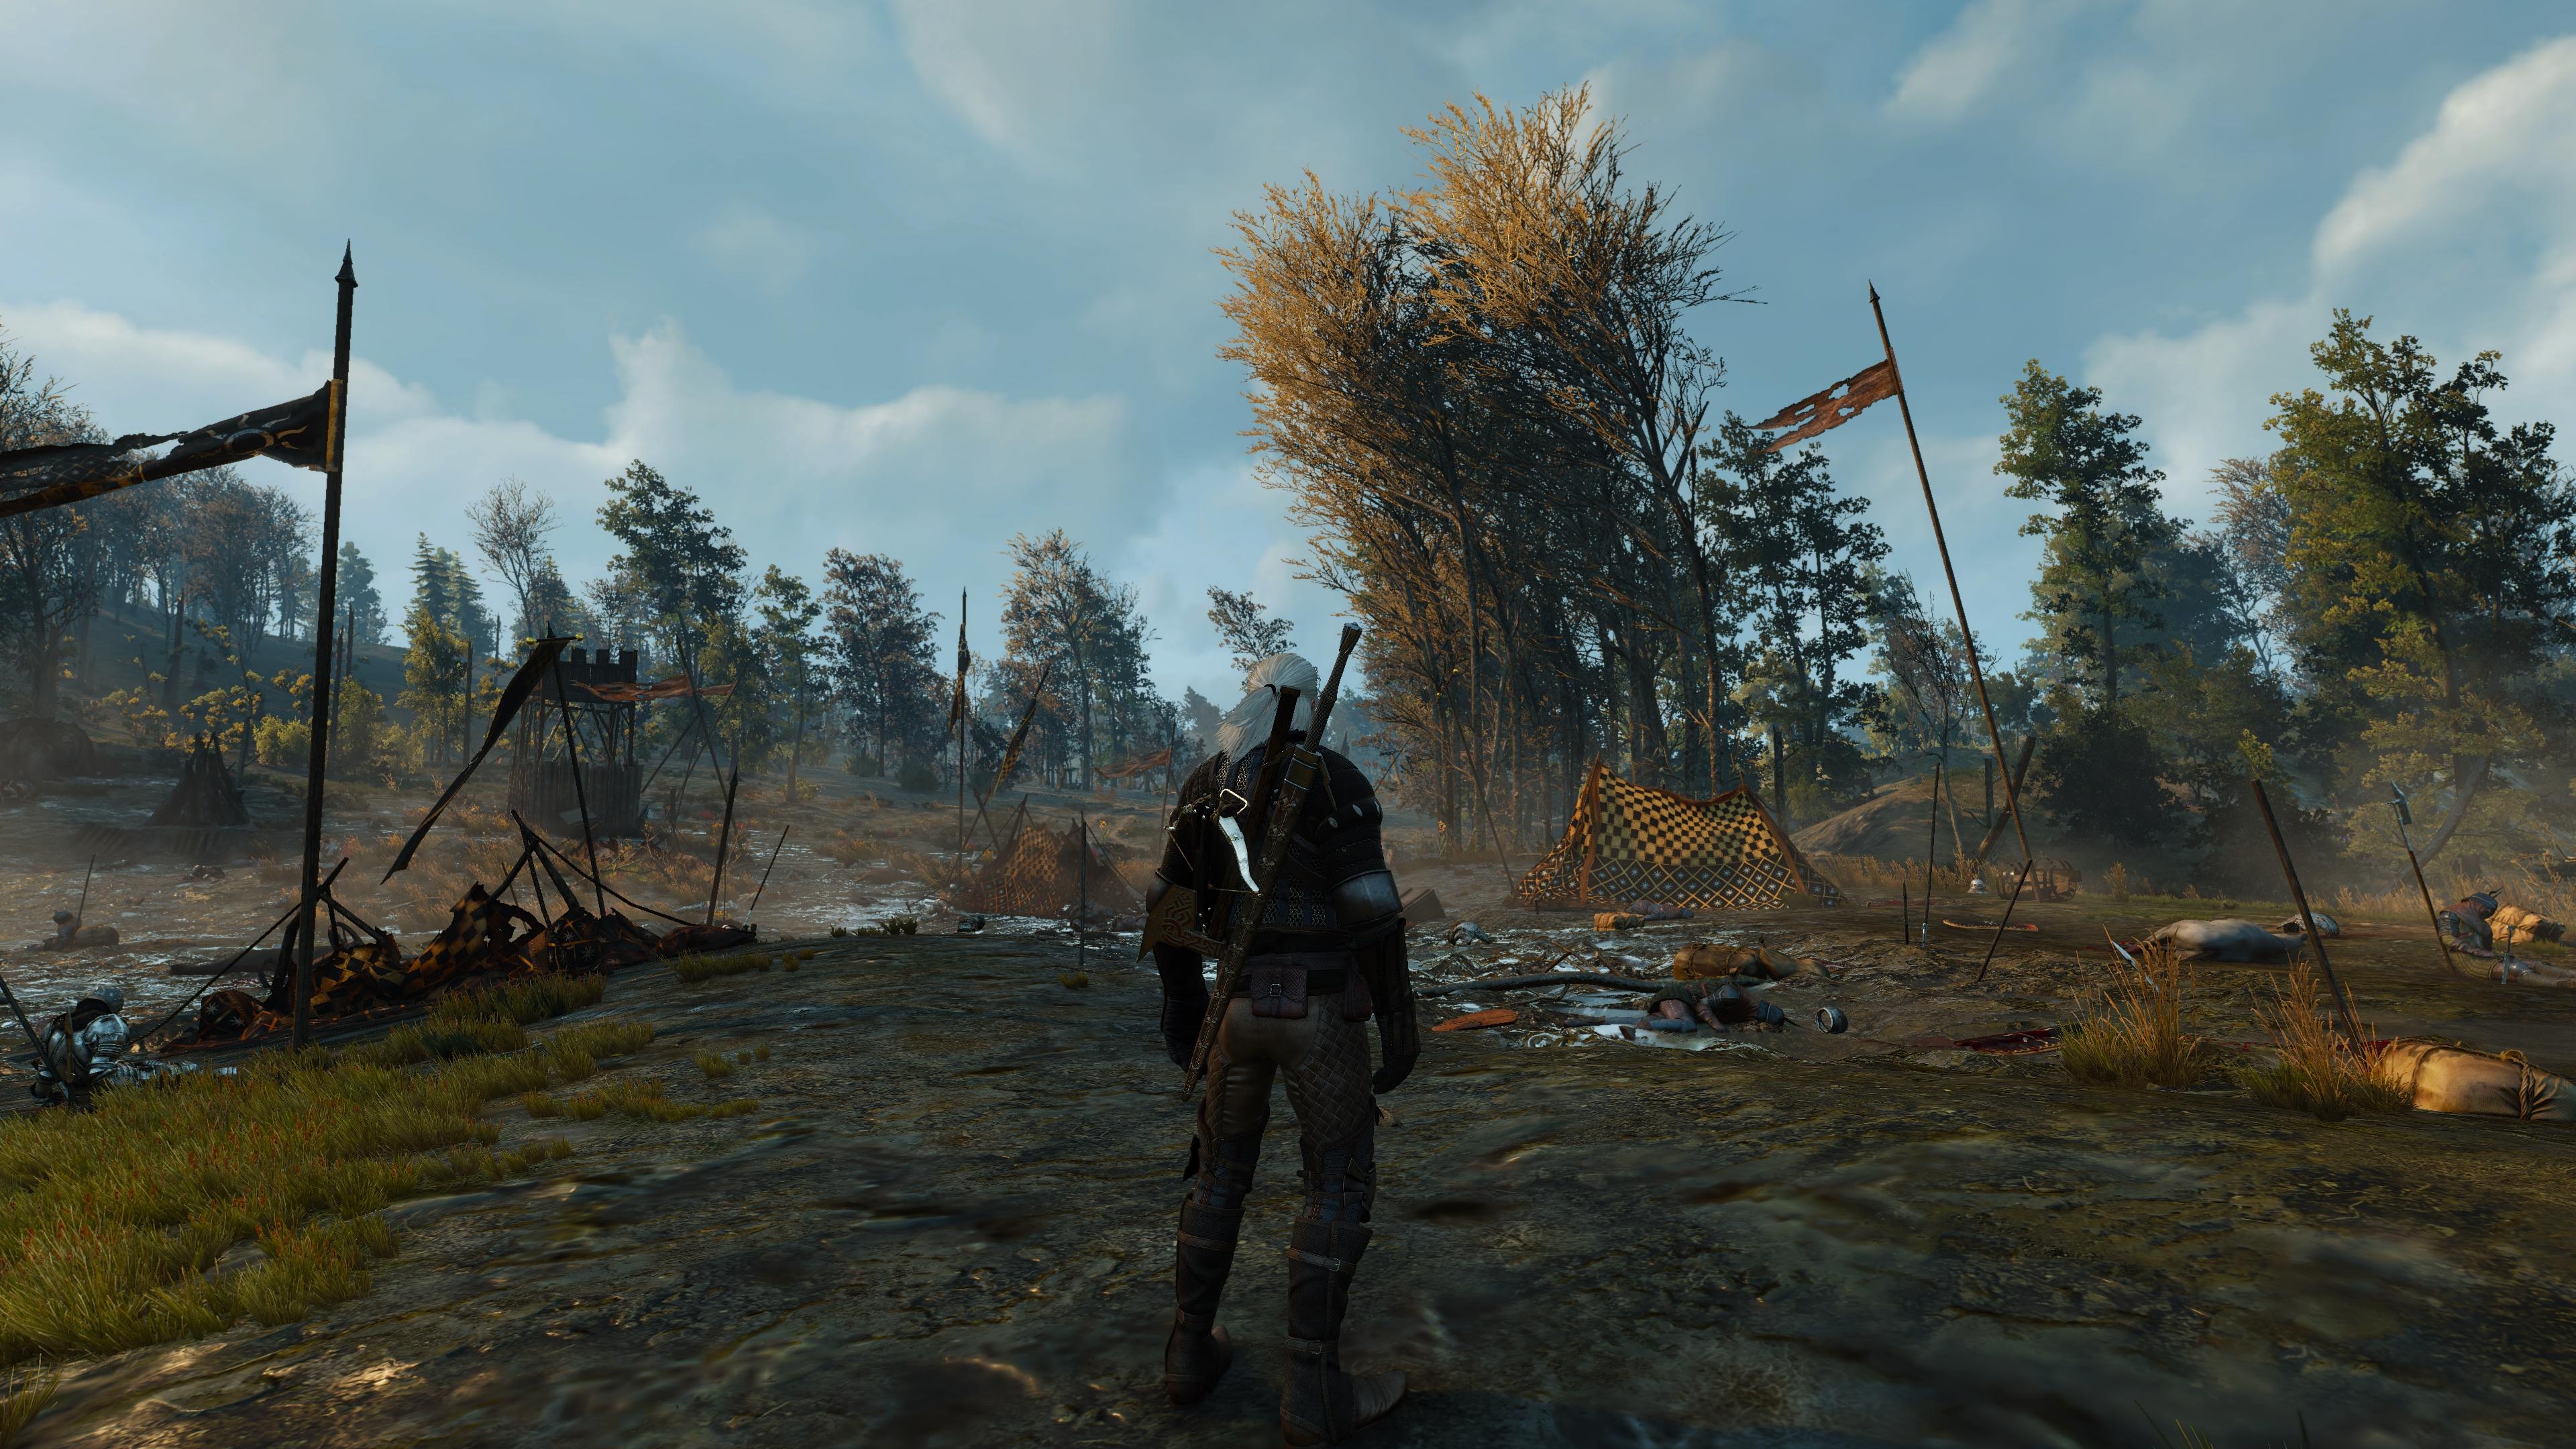 The Witcher 3 Super-Resolution 2017.12.17 - 18.00.17.55.jpg - Witcher 3: Wild Hunt, the